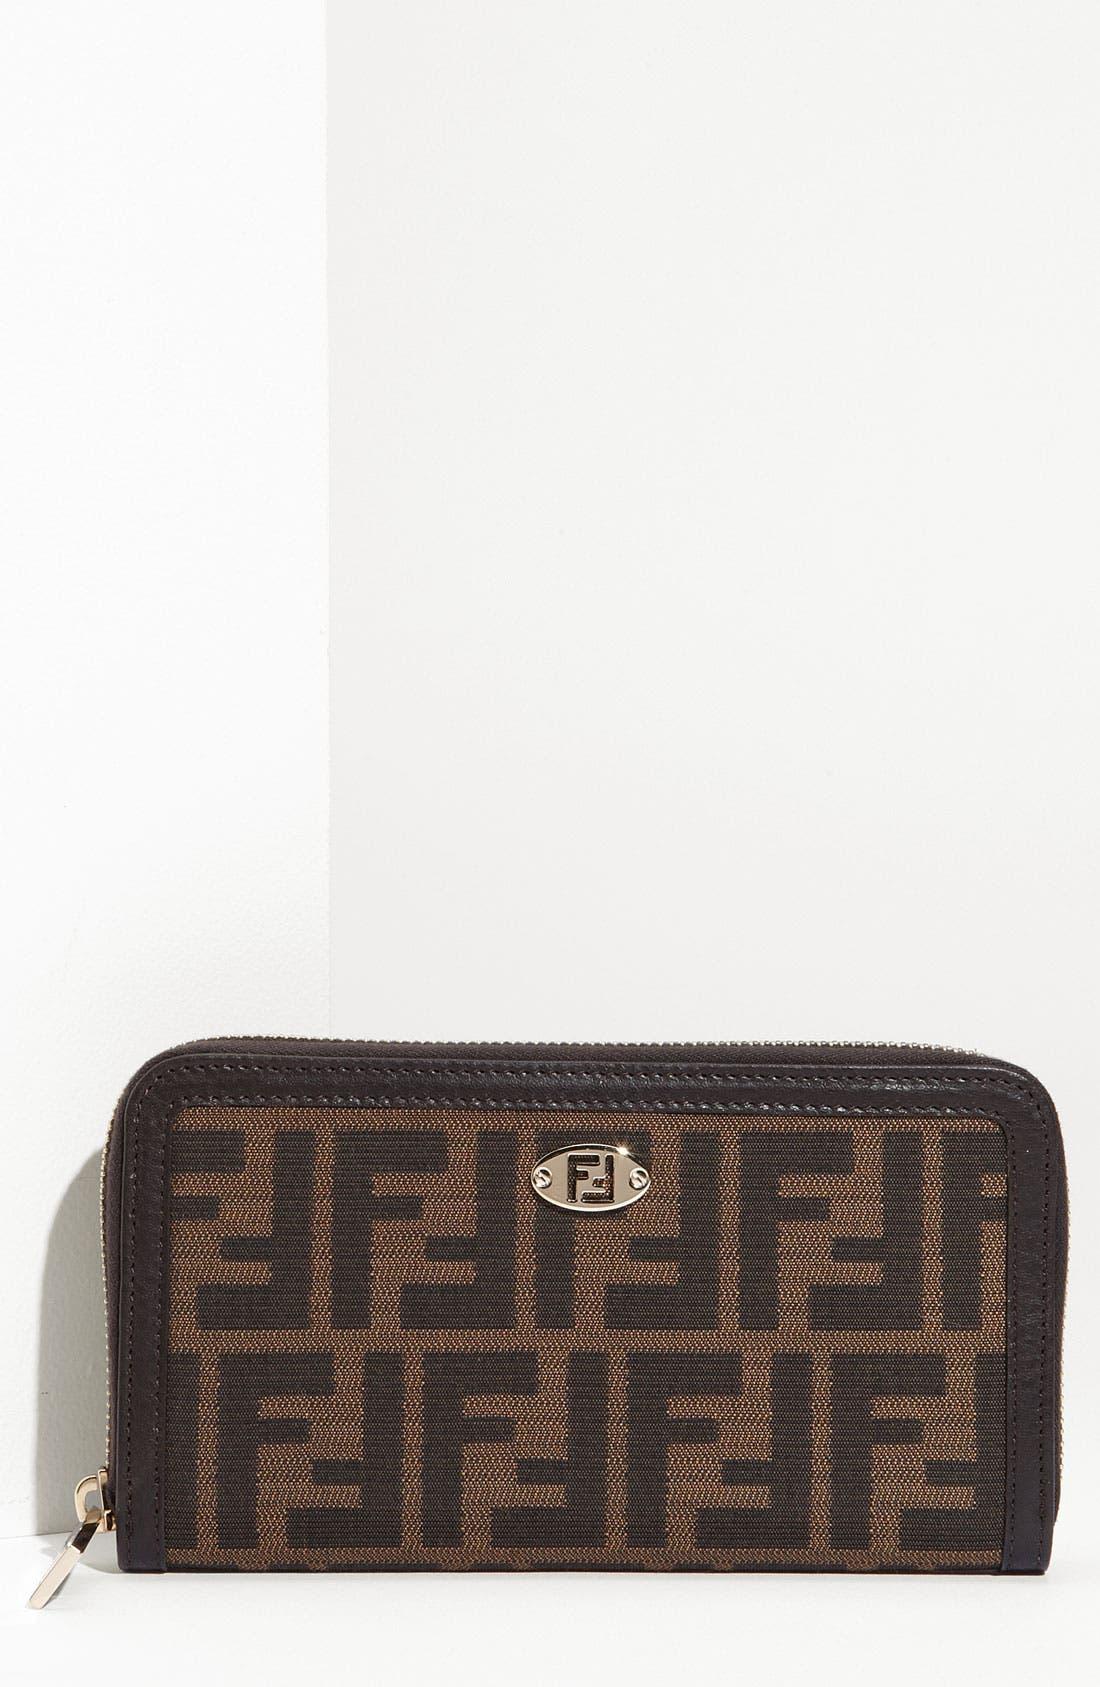 'Zucca' Zip Around Wallet,                         Main,                         color, Tobacco / Dark Brown